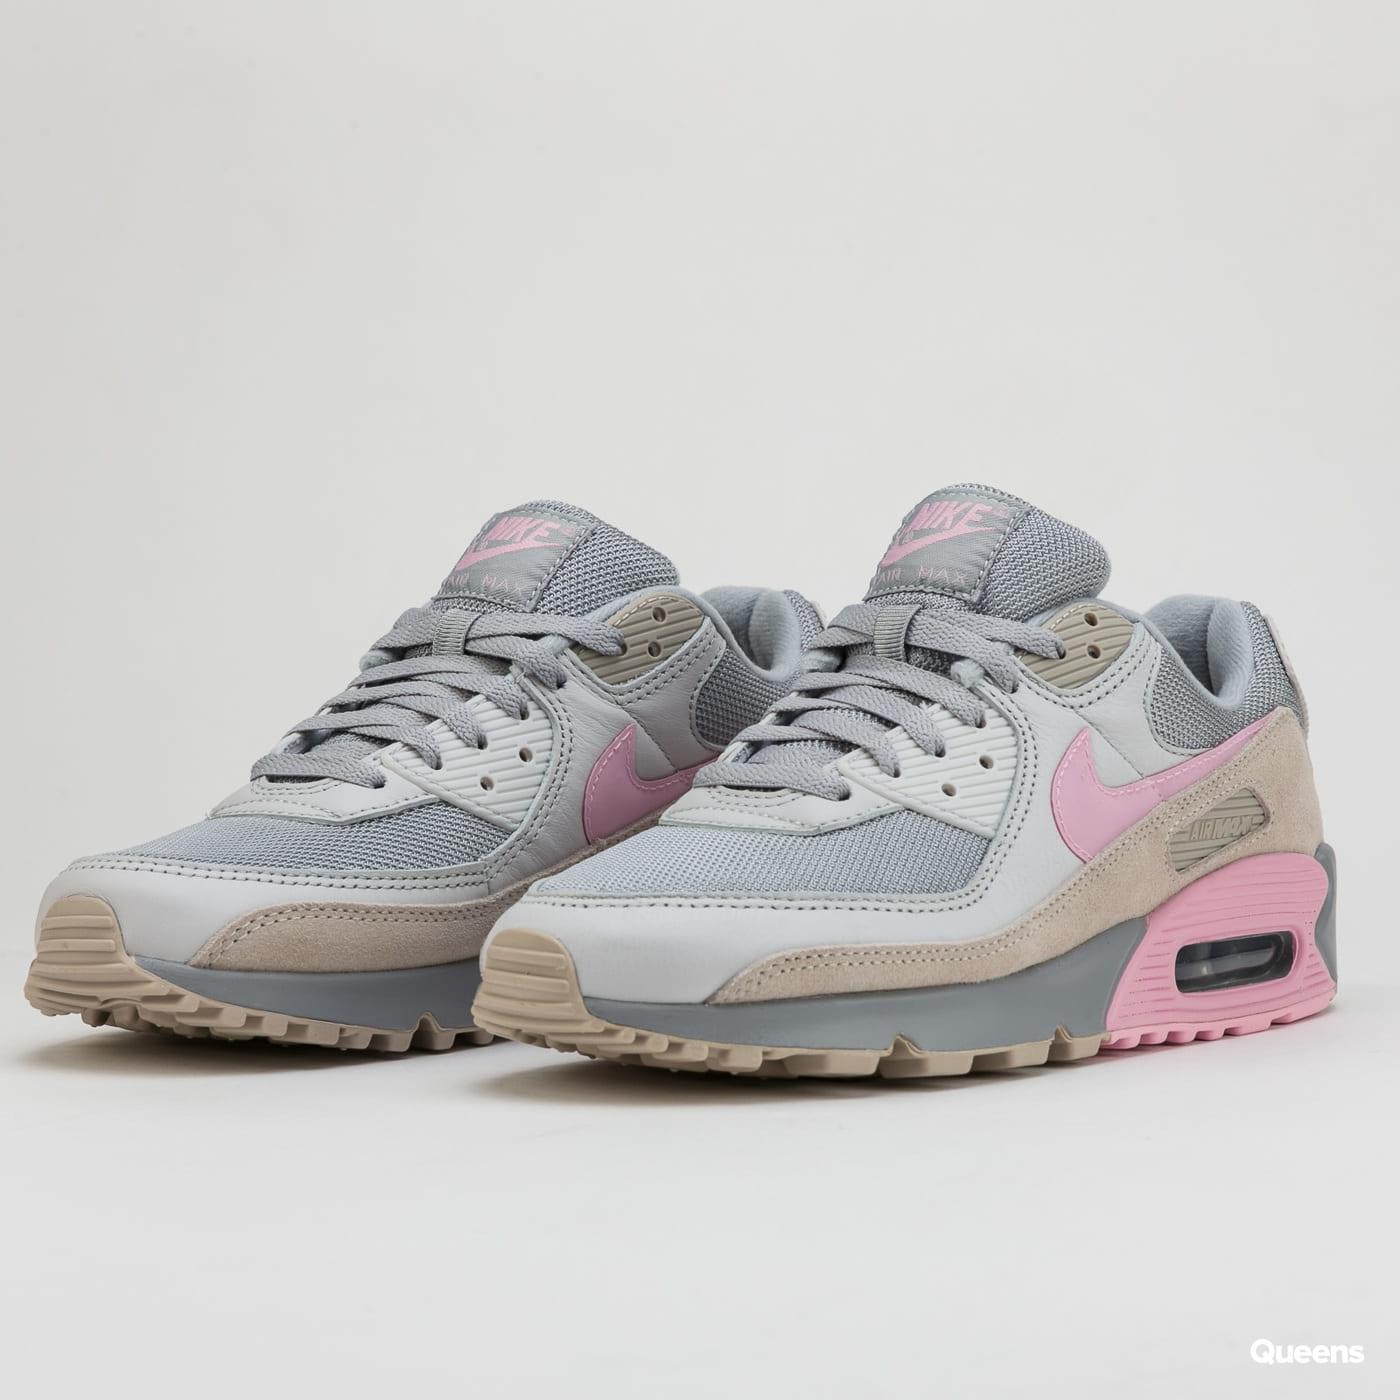 Sneakers Nike Air Max 90 vast grey